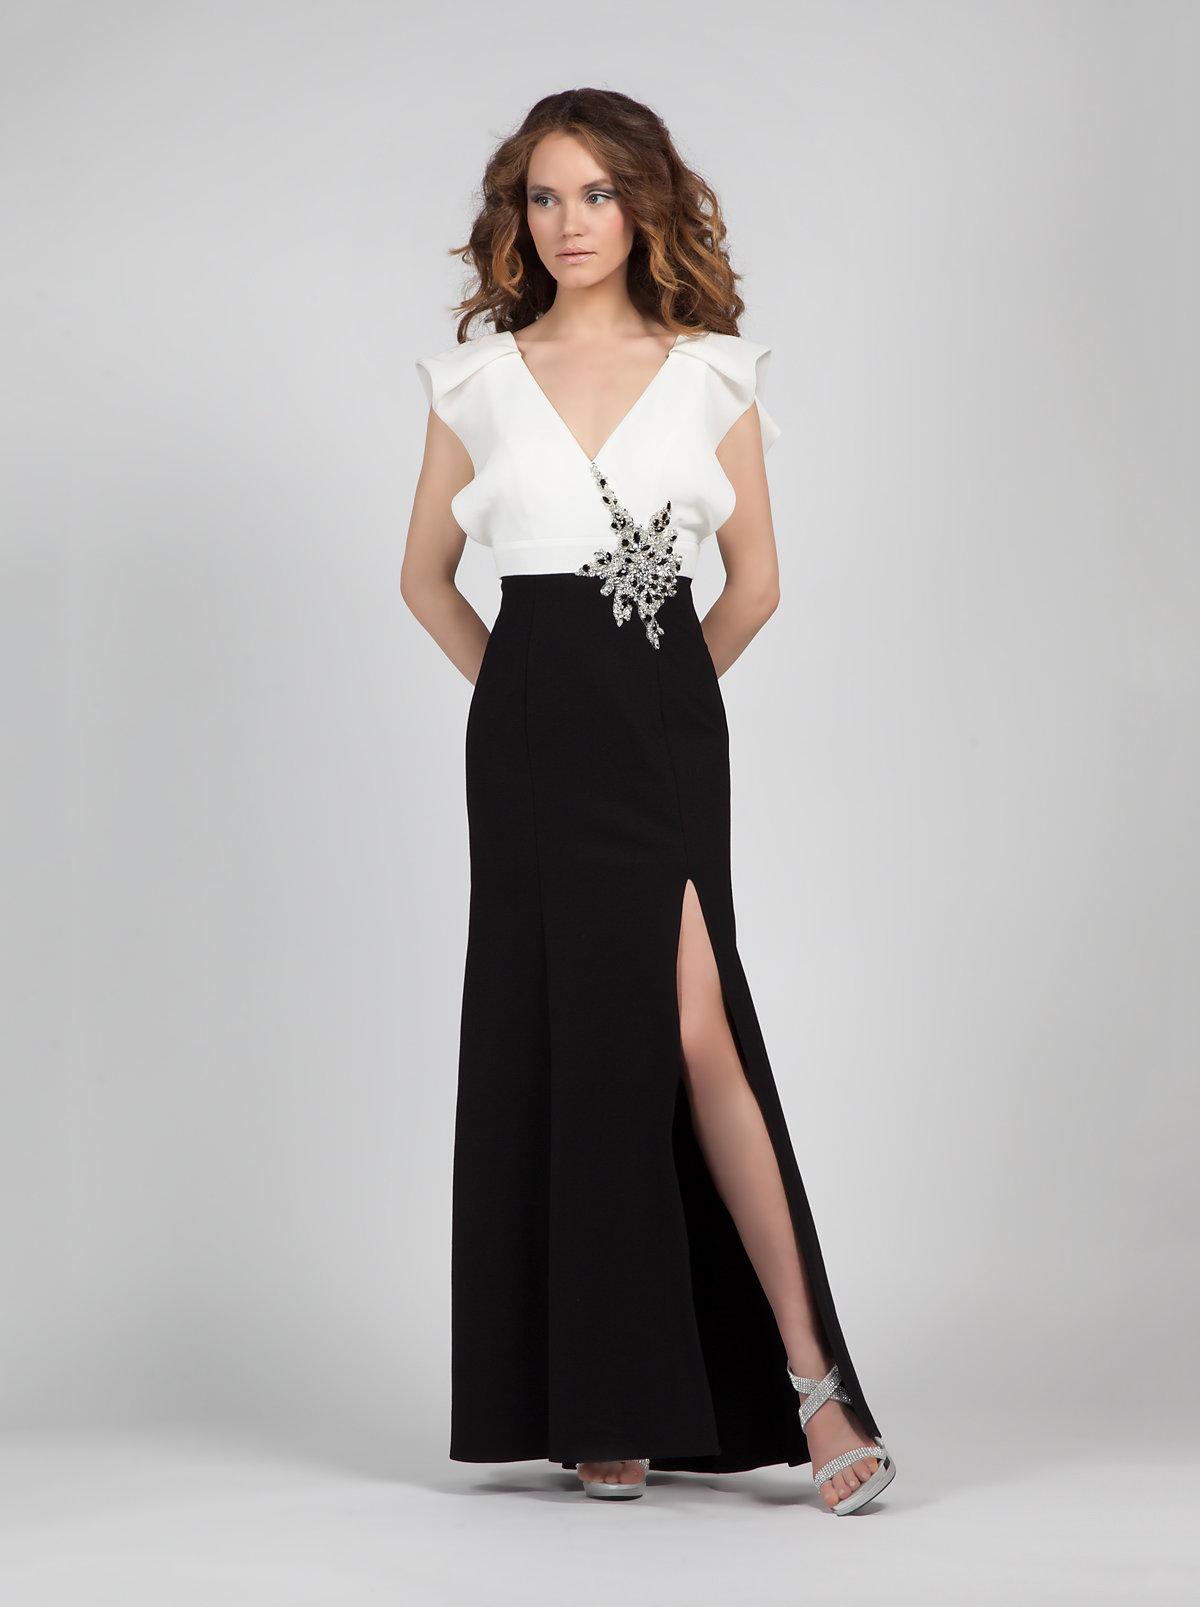 вечерние платья классика фото